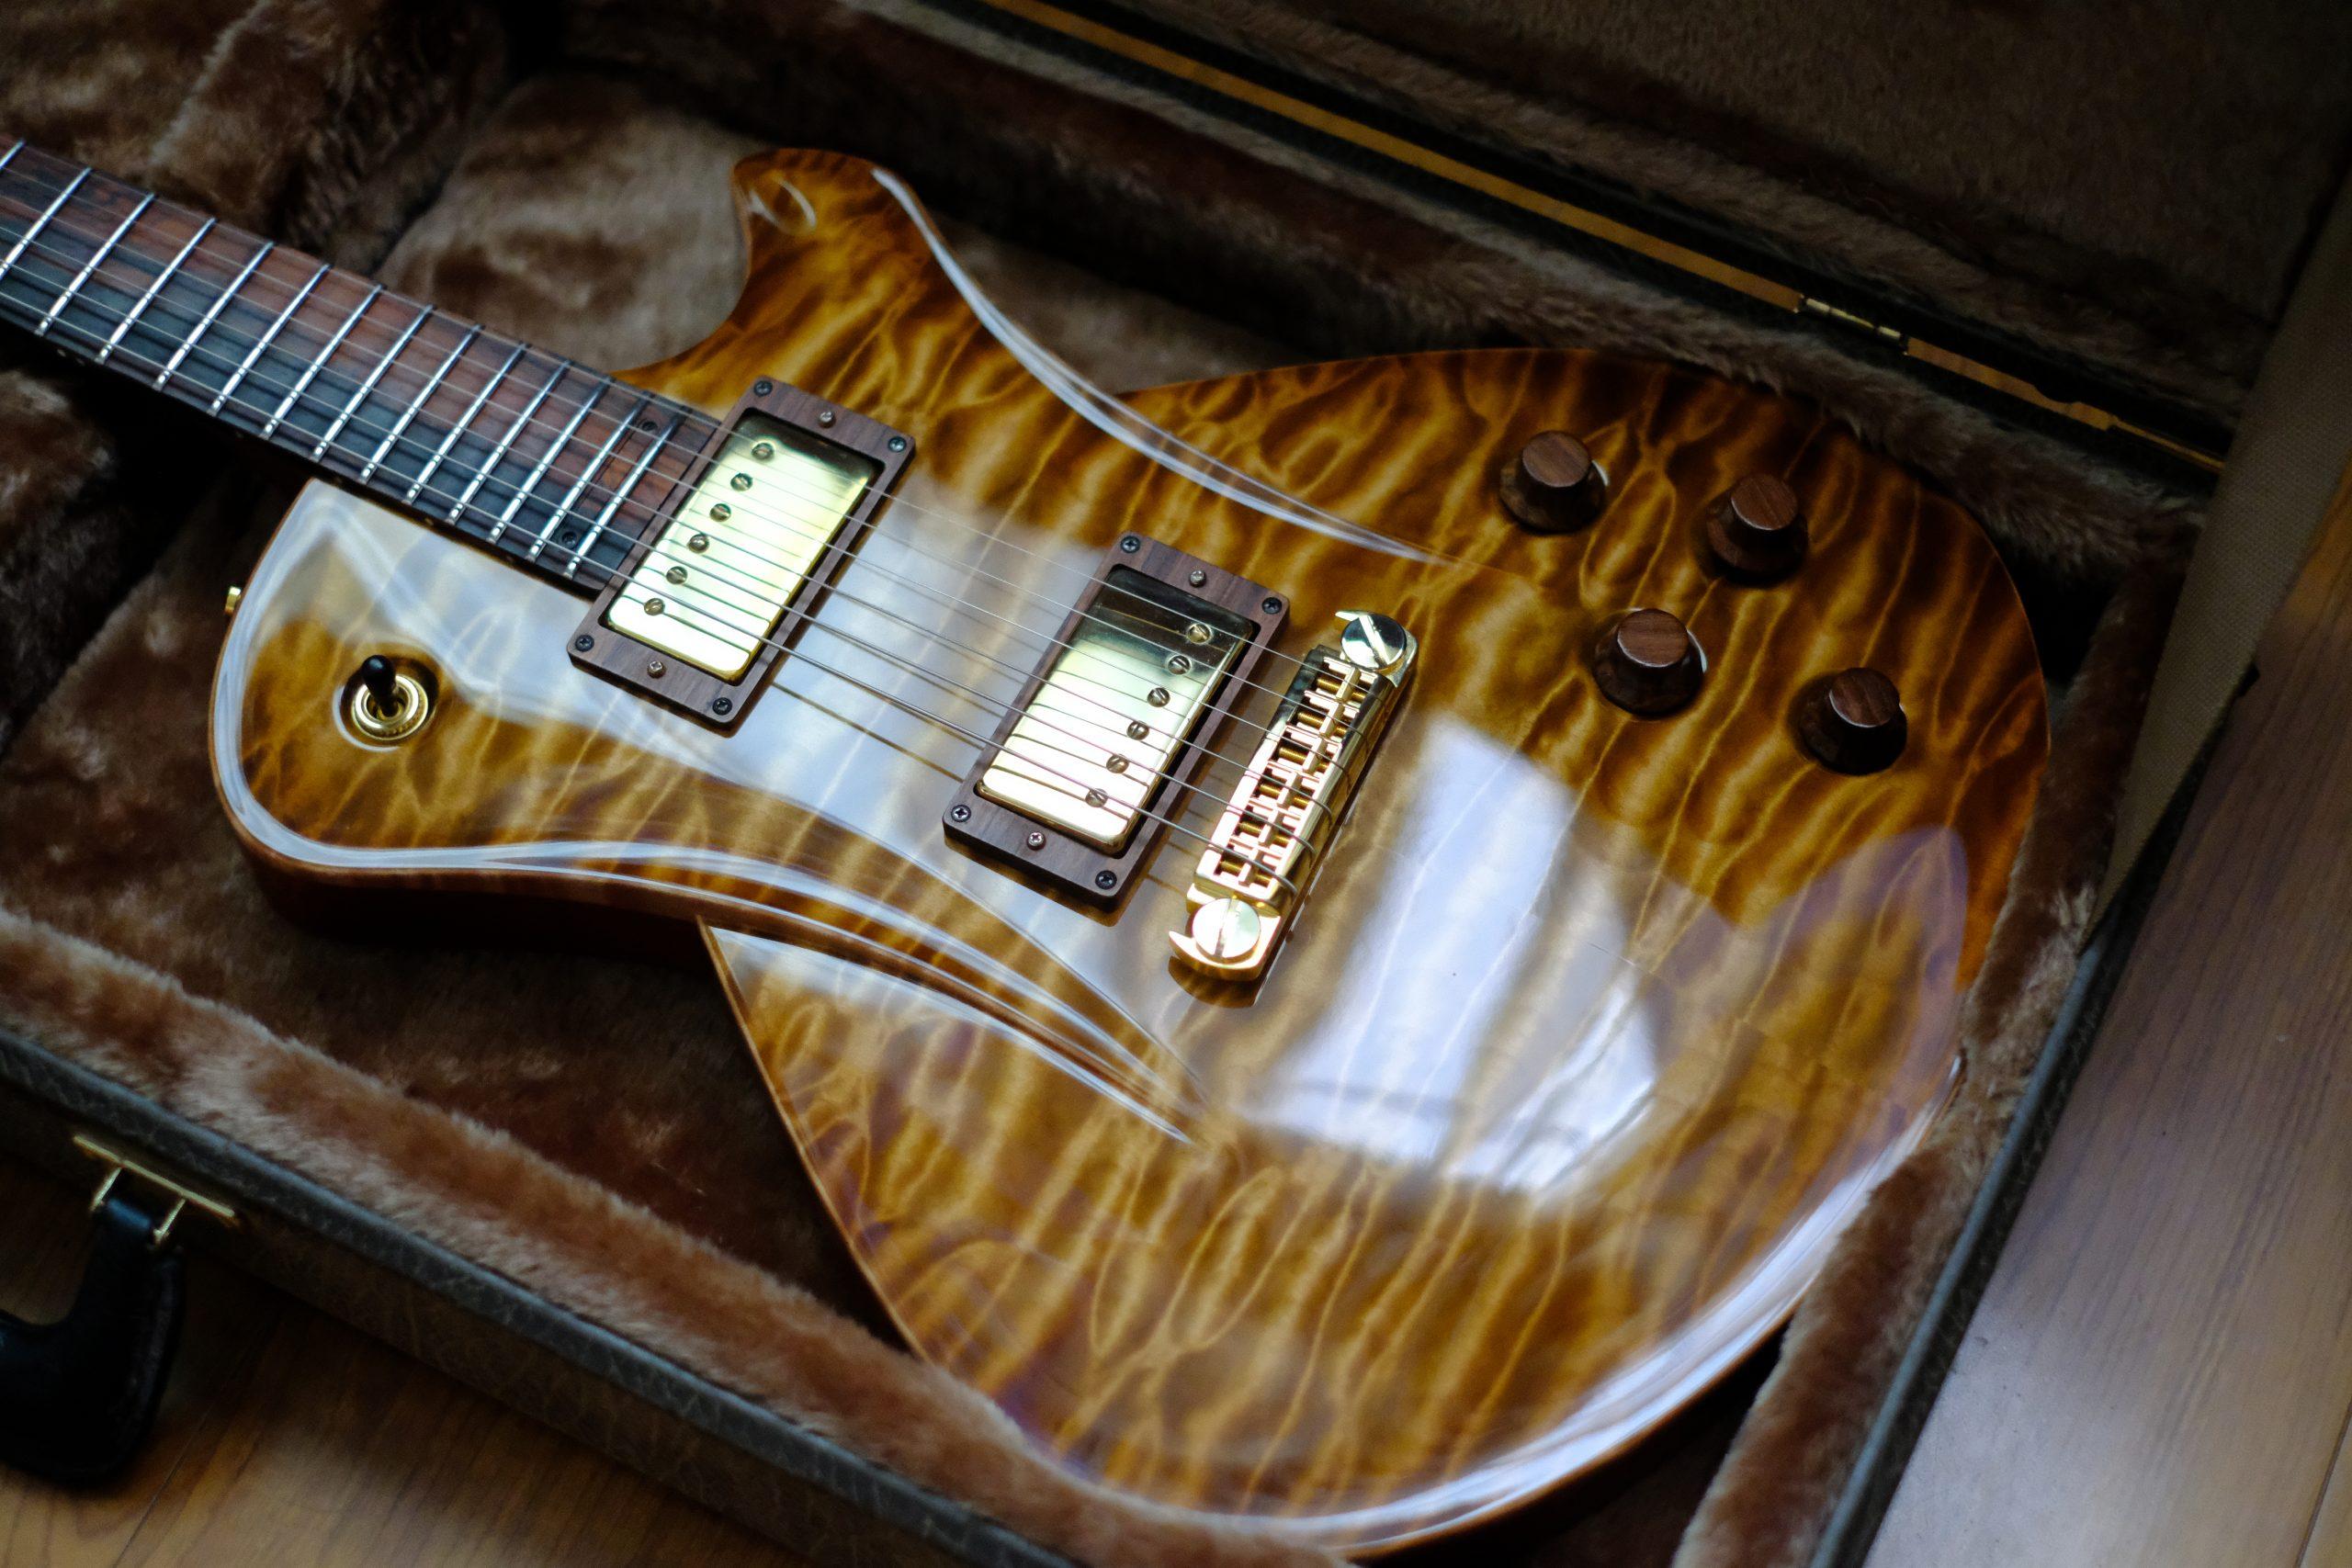 【FUJIFILM】JAZZギターを始める